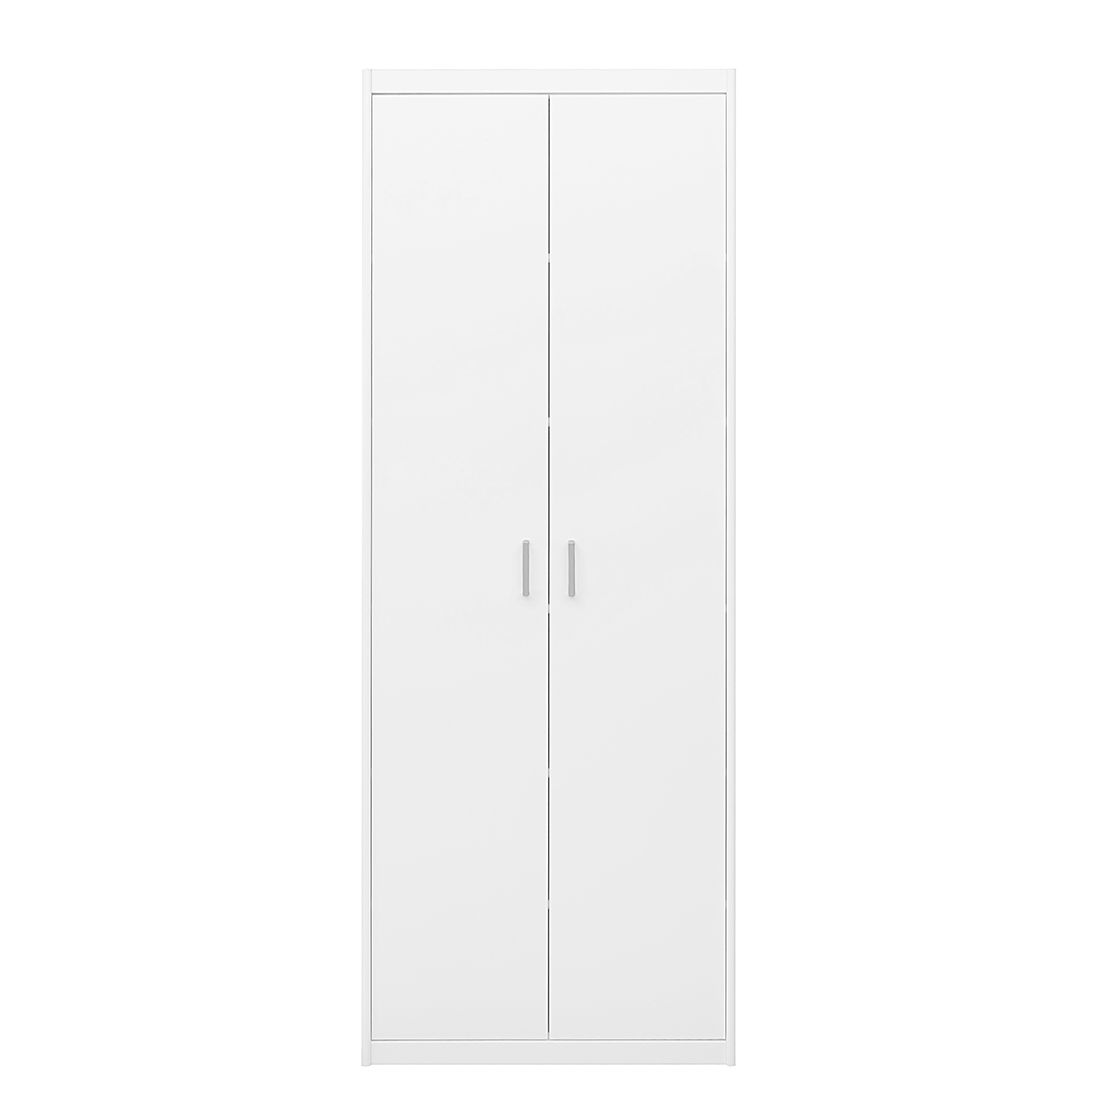 Armoire polyvalente Soft Plus I - Blanc, Cs Schmal